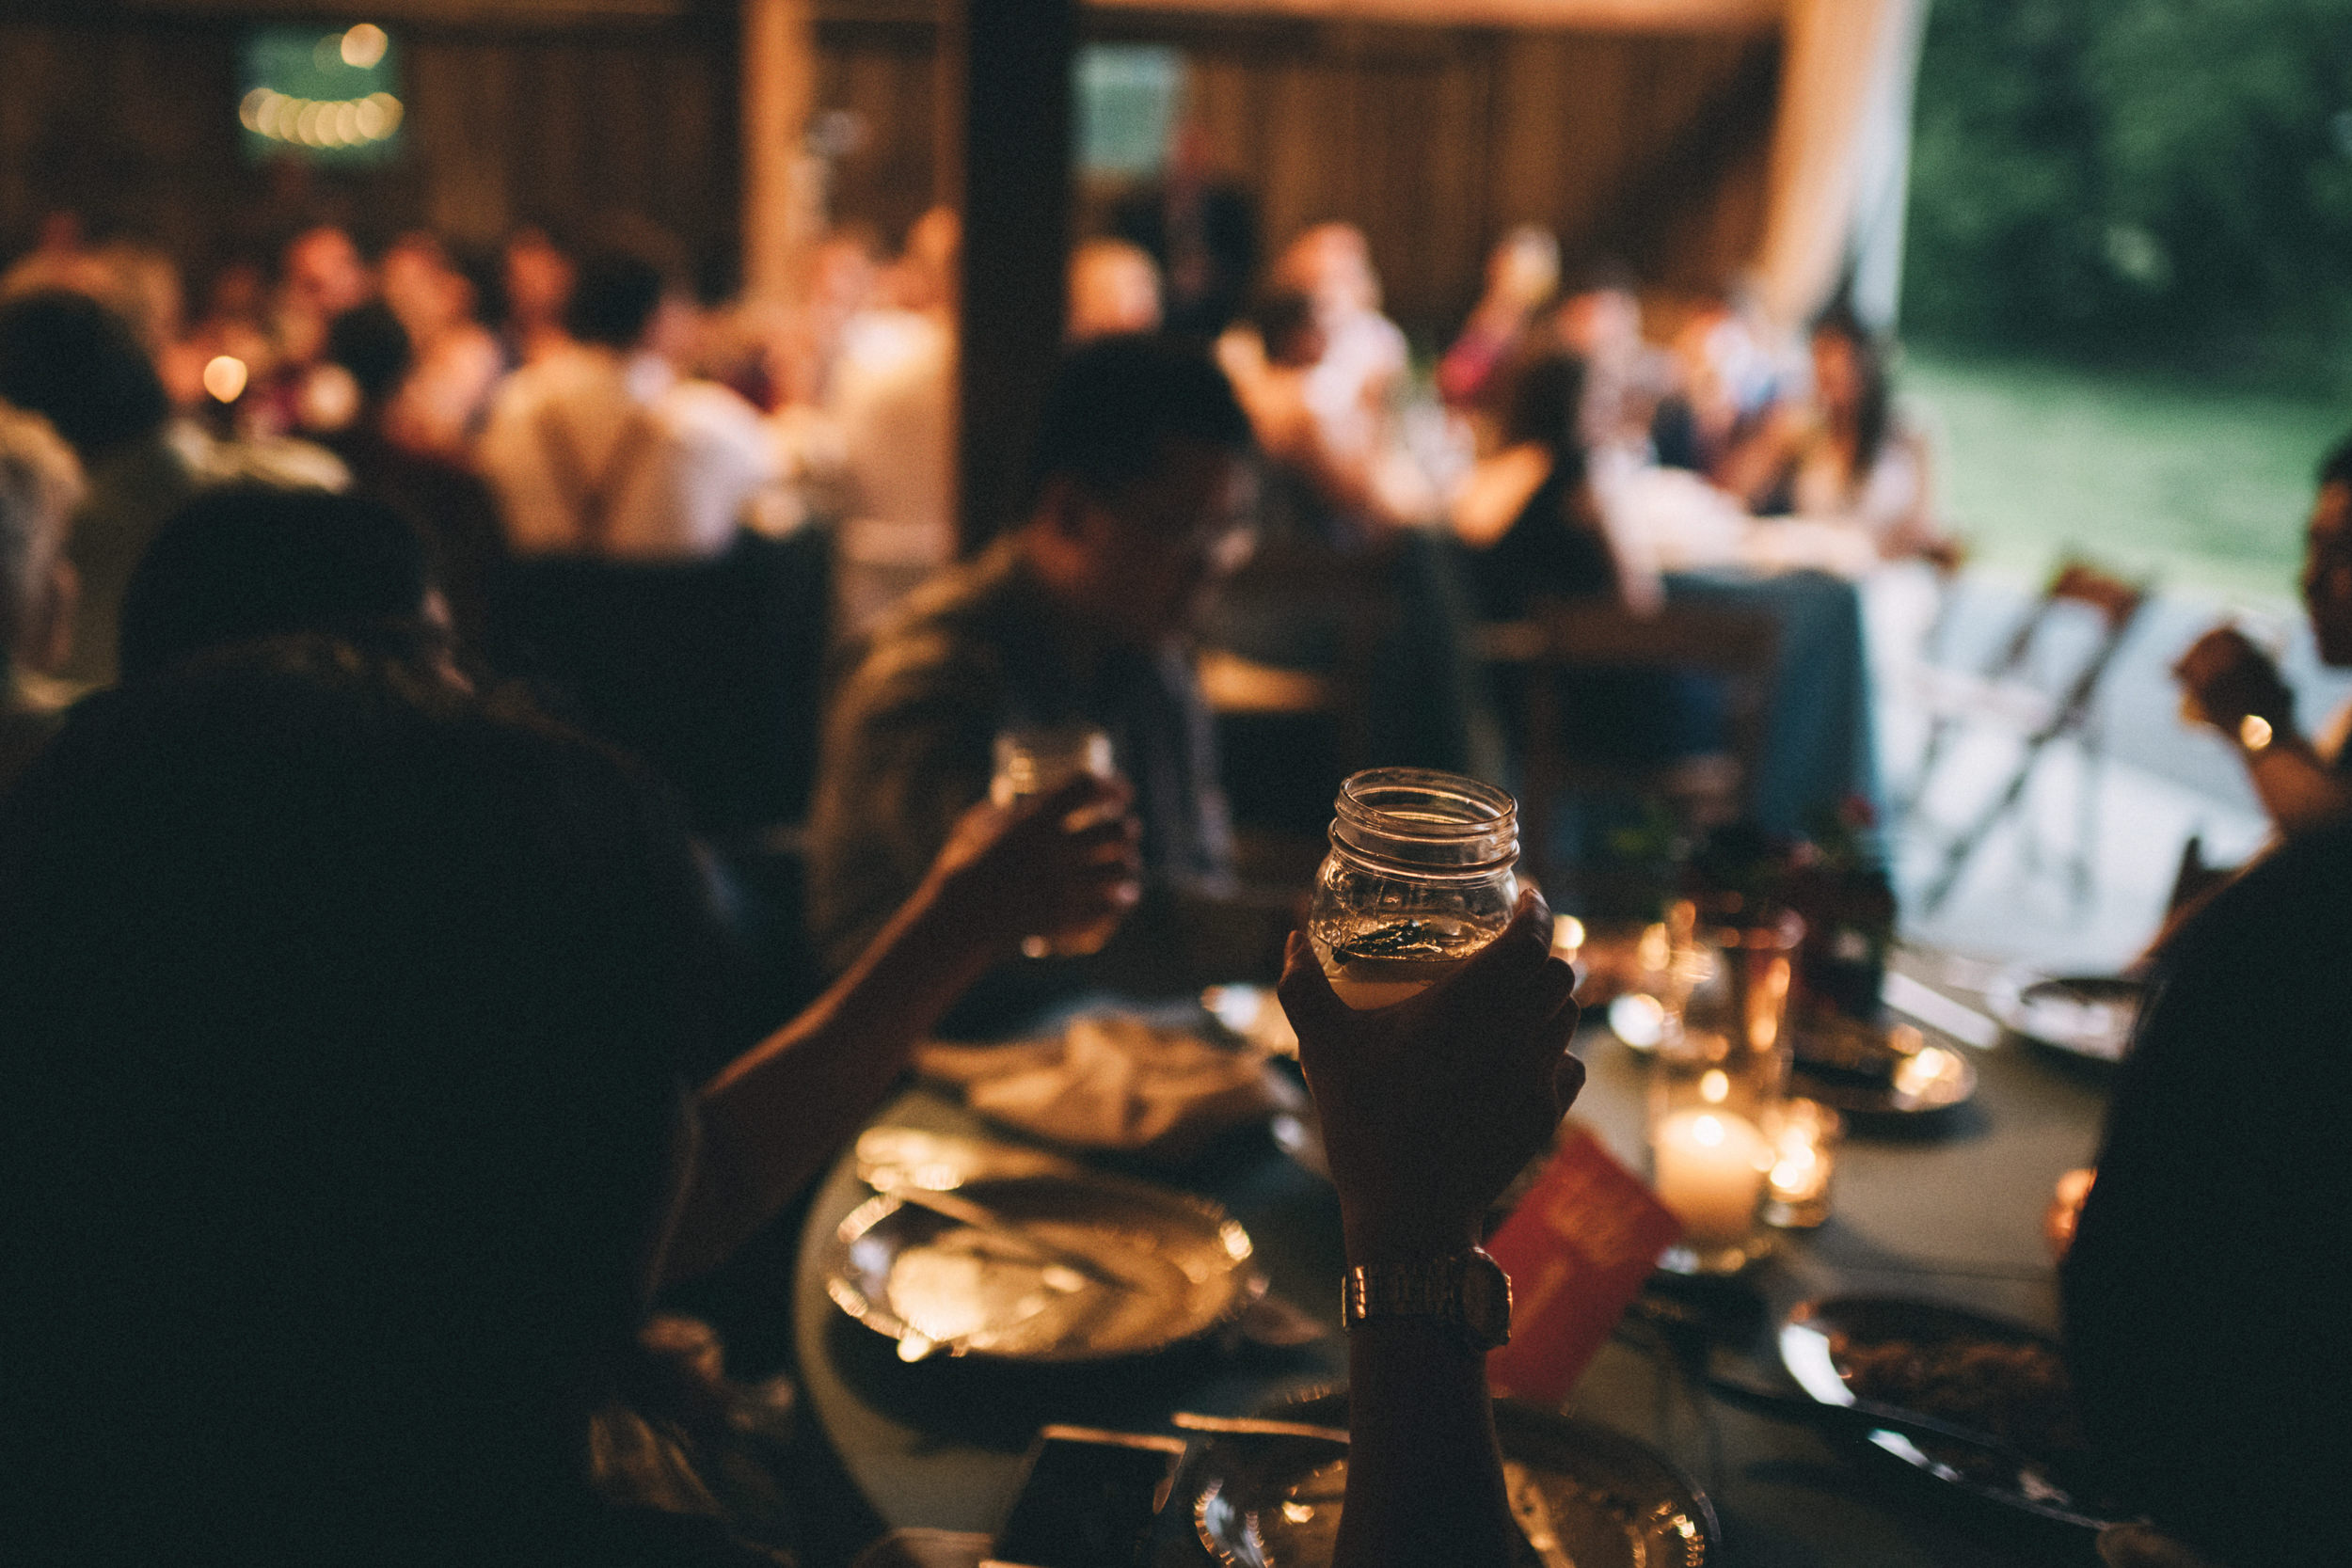 Louisville-Kentucky-Wedding-and-Elopement-Photographer-Sarah-Katherine-Davis-Photography-Summer-Jewel-Toned-Wedding-Chineese-Tea-Ceremony-Warrenwood-Manor-Danville-858.jpg